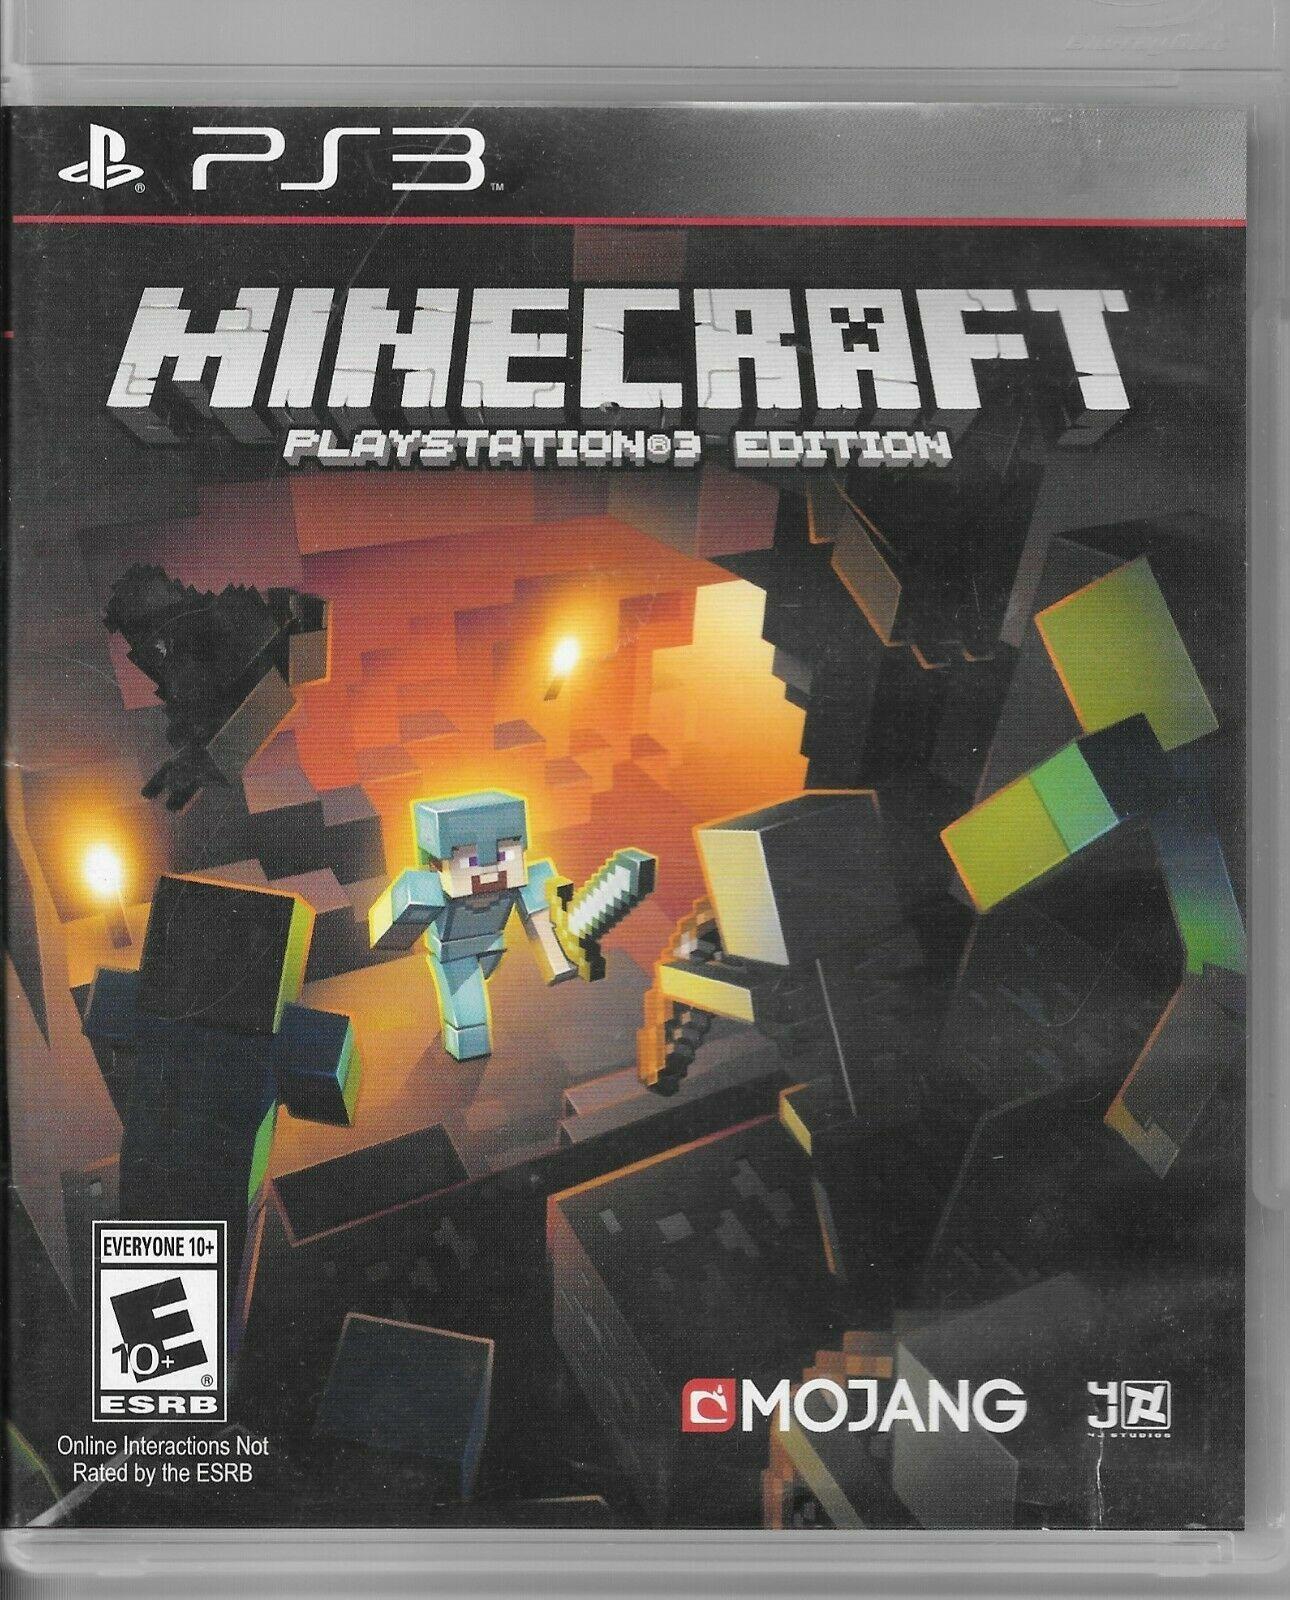 Minecraft Playstation 3 Edition Mojang 2014 Ideas Of Minecraft Minecraft In 2020 Playstation Minecraft Best Graphics